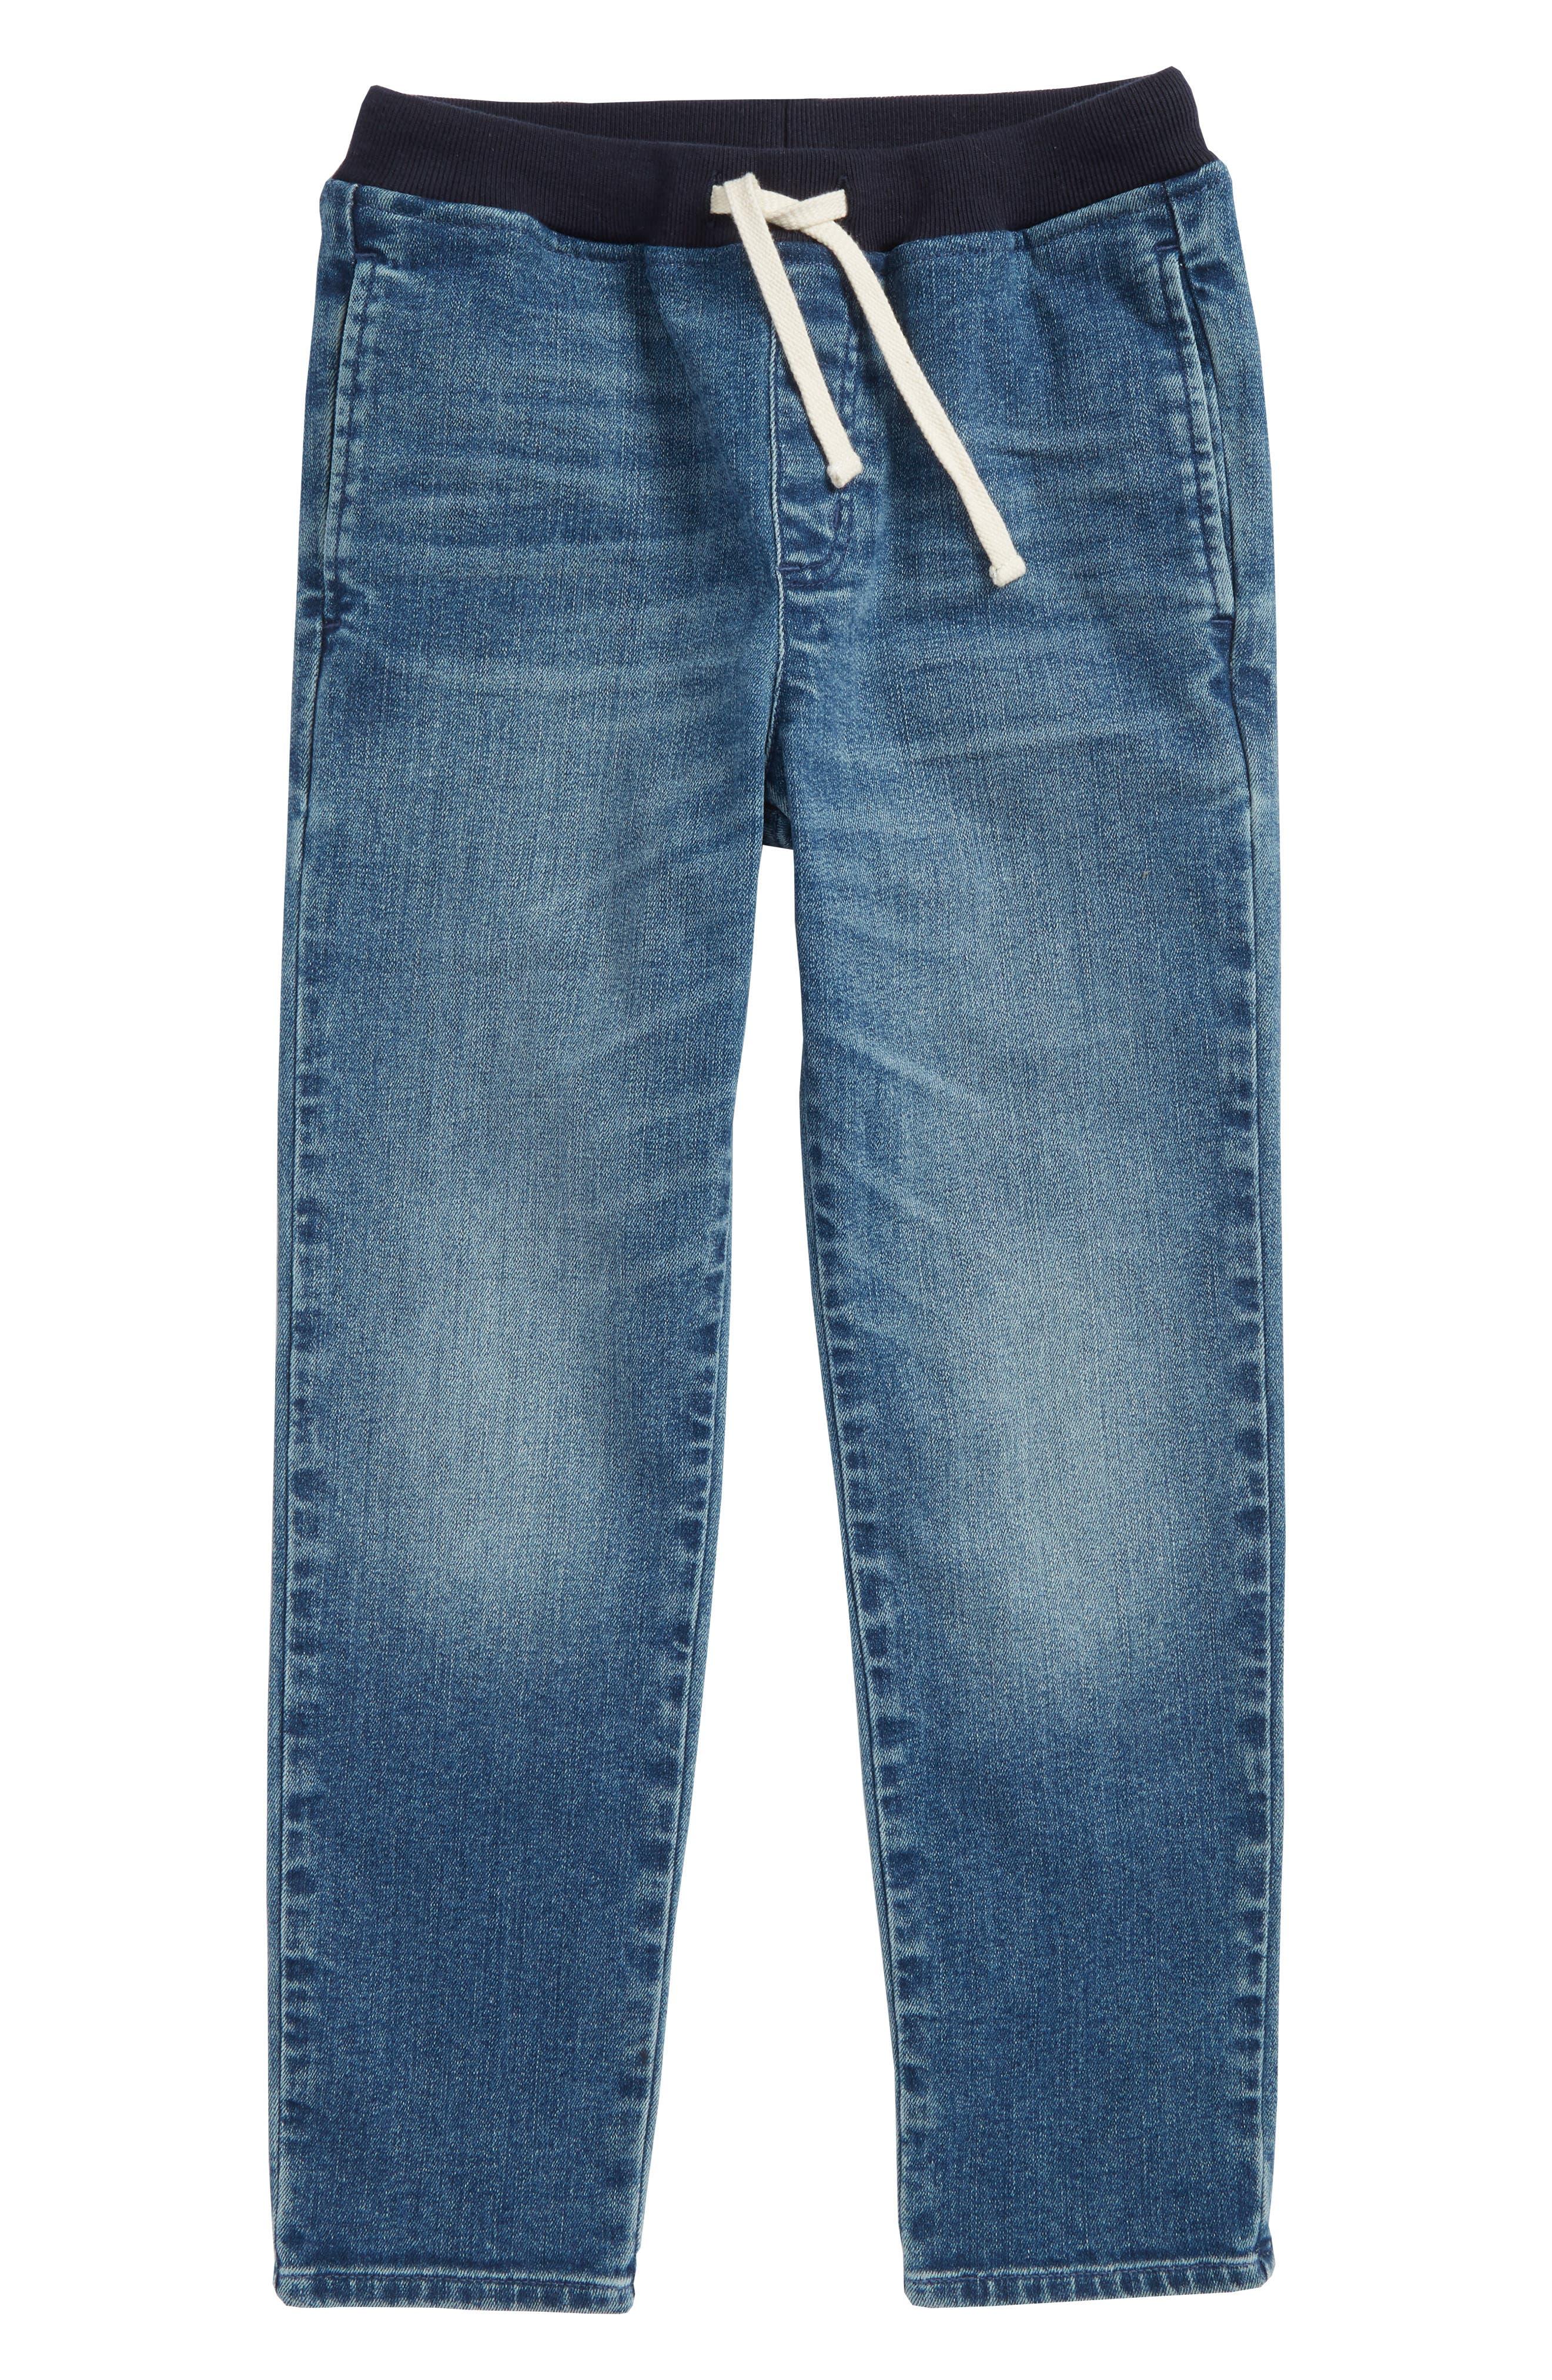 Pull-On Denim Pants,                             Main thumbnail 1, color,                             400